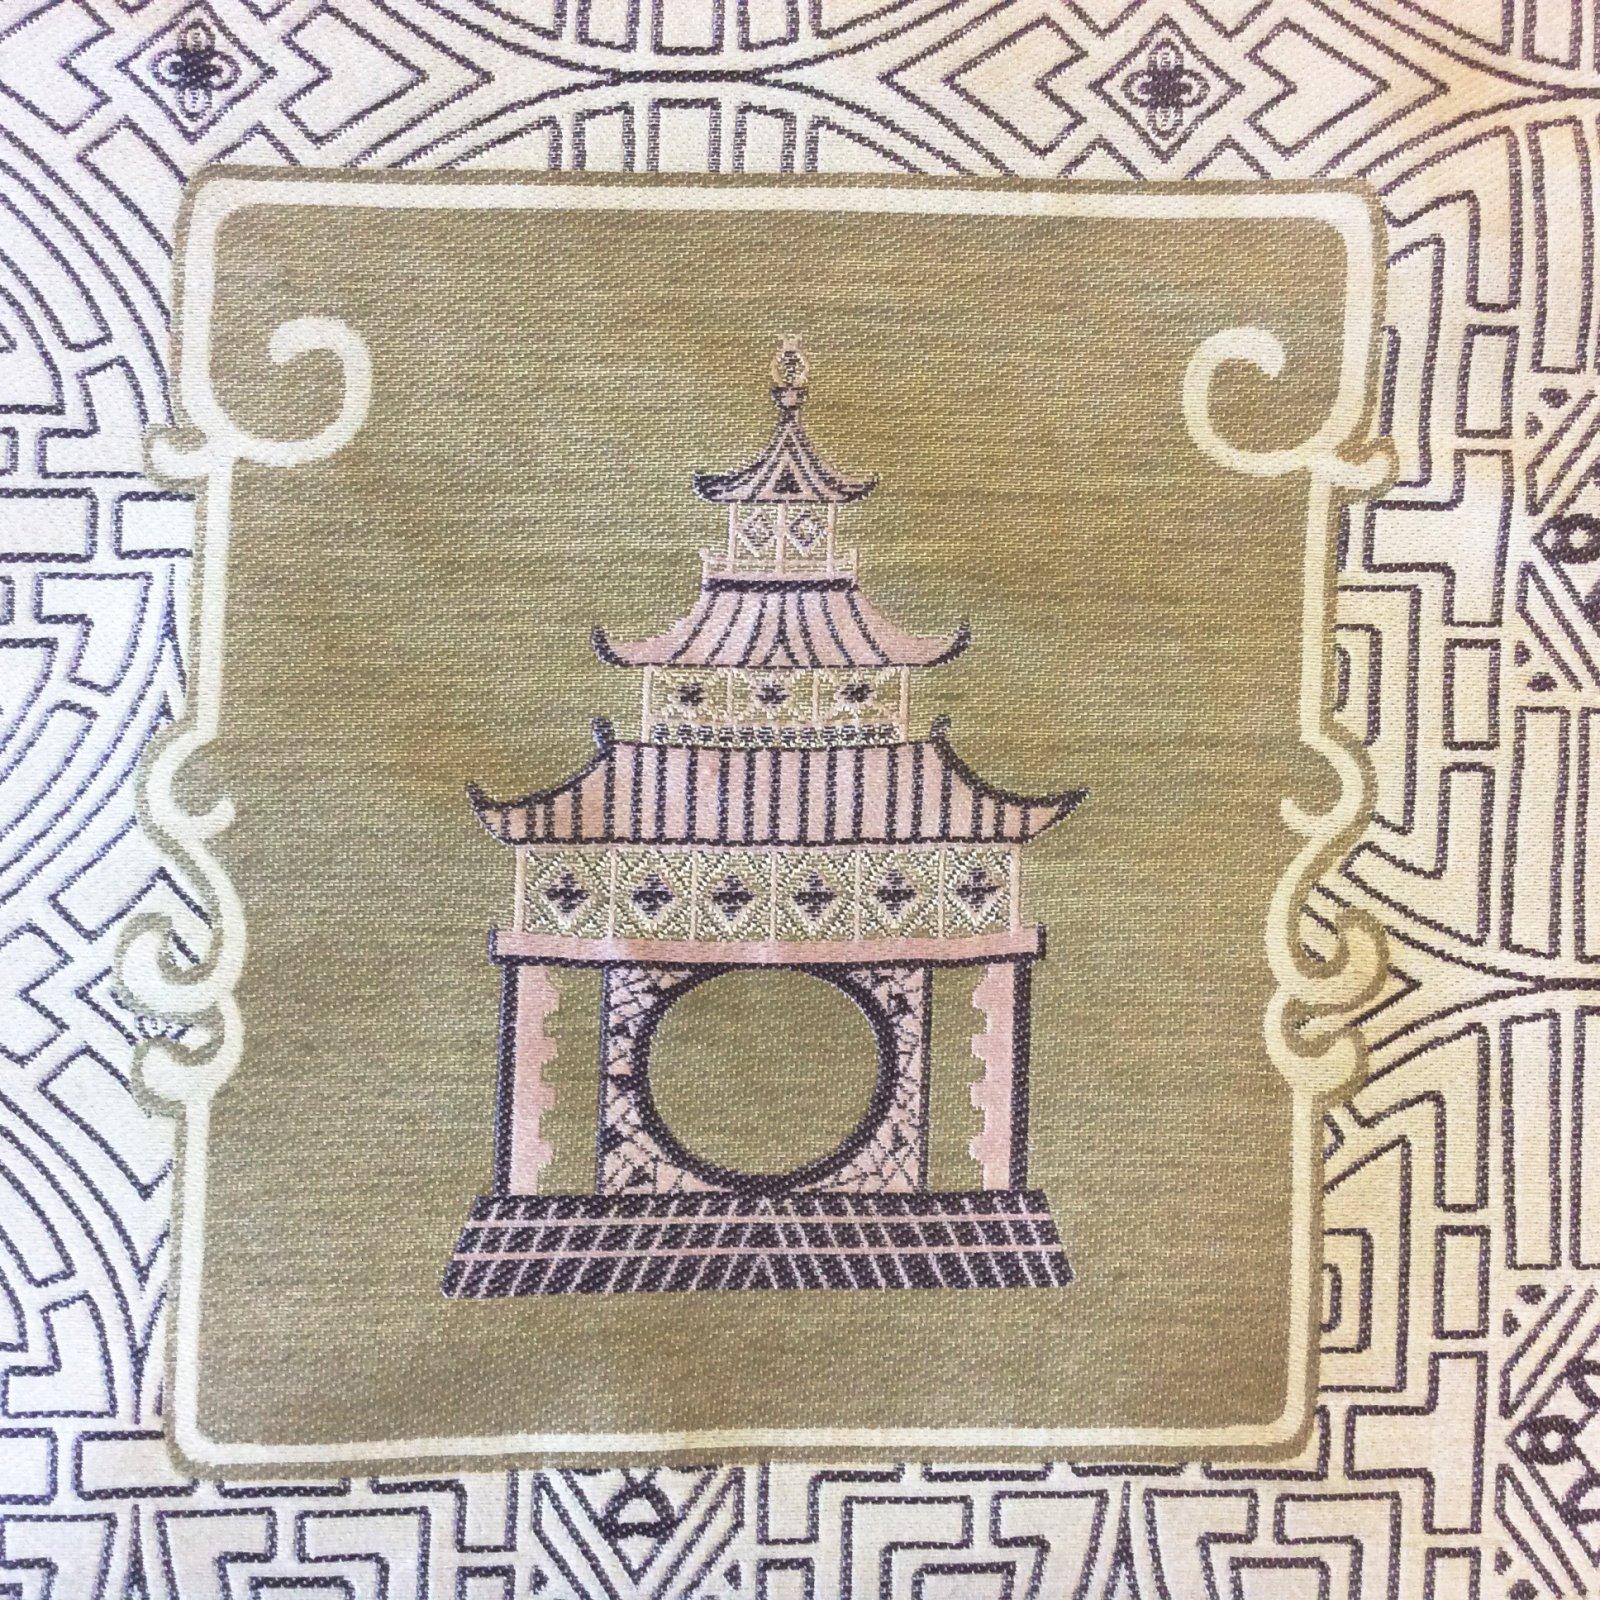 Asian Pagoda China Beautiful Asian Woven Tapestry Upholstery Home Decor Fabric NL059